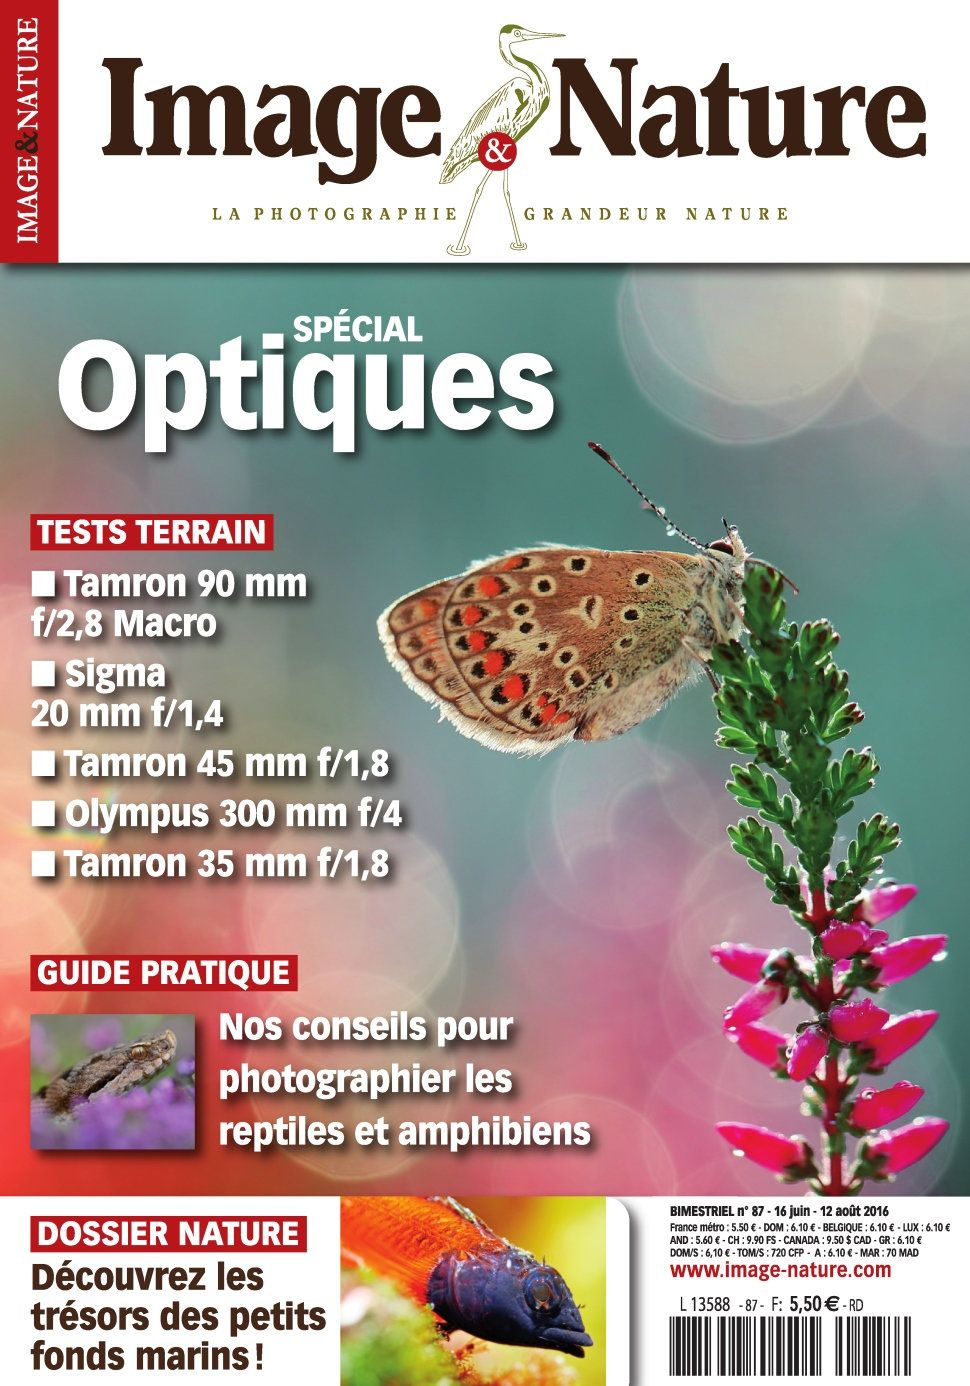 Image & Nature 87 - Juillet/Aout 2016